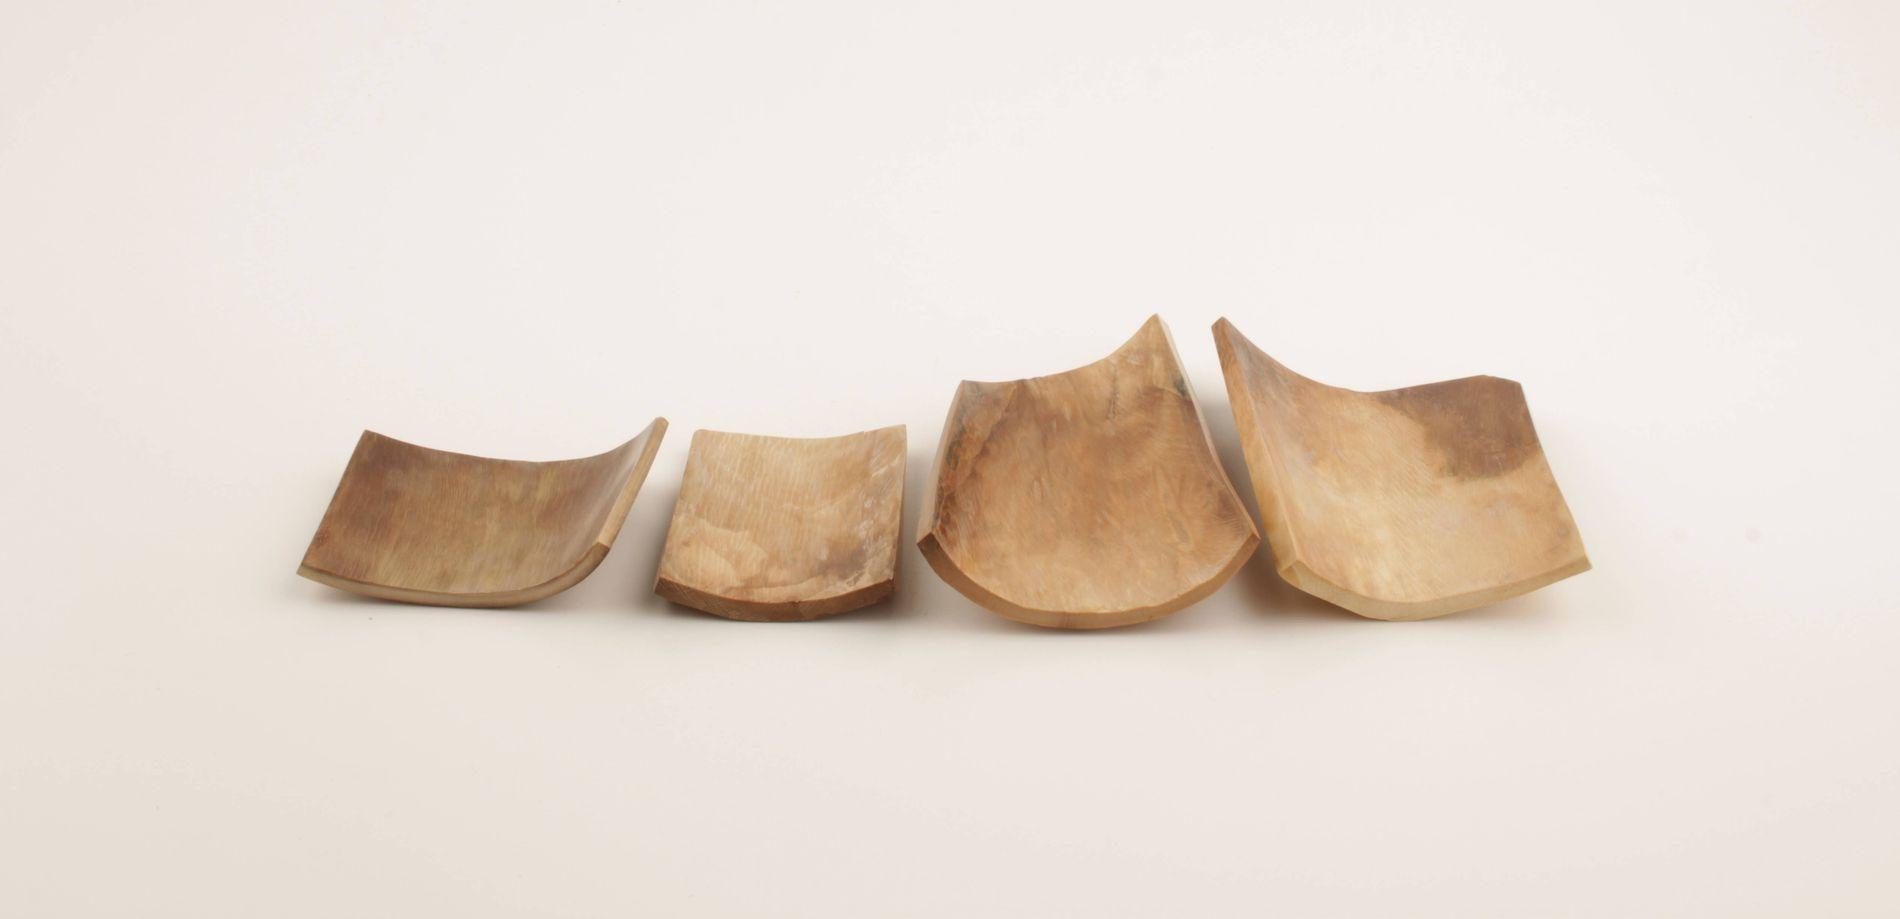 Brown-beige mammoth ivory pieces